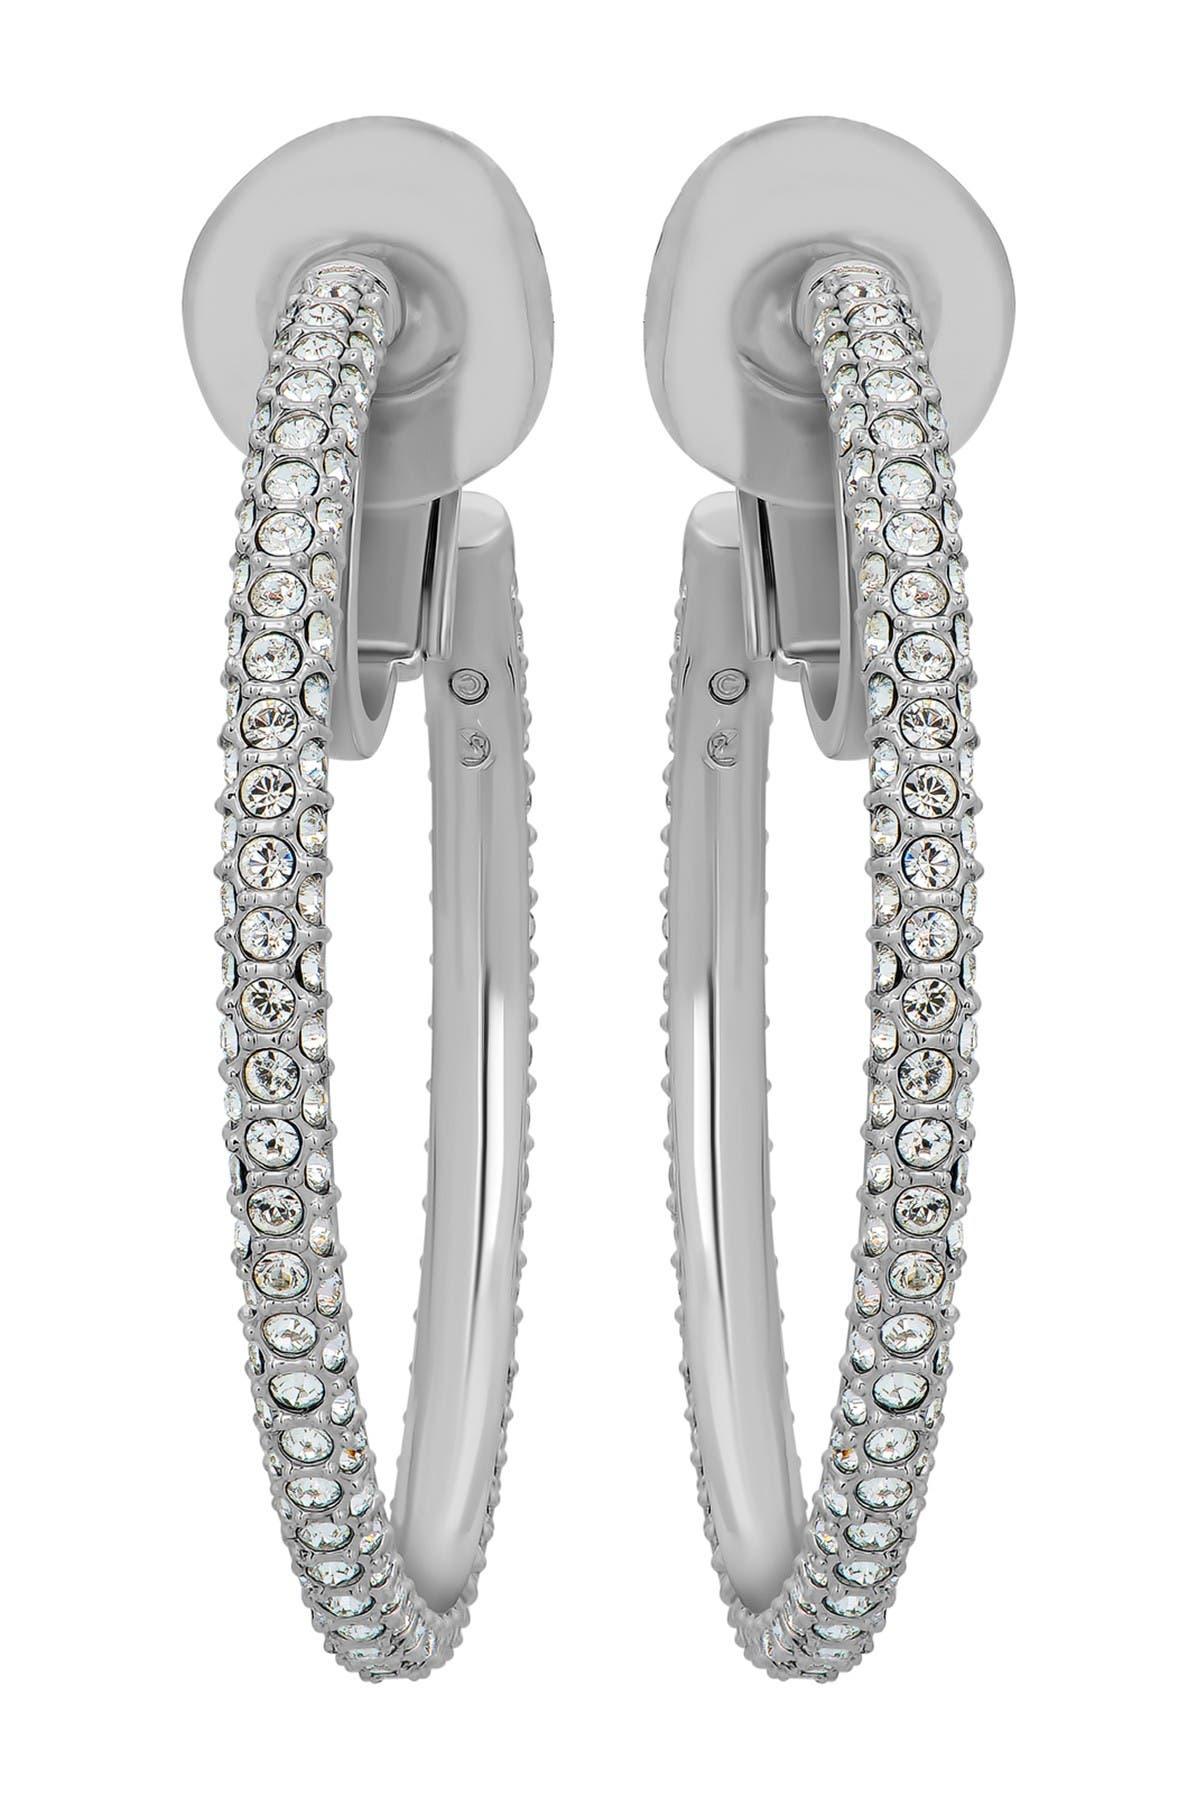 Image of Swarovski Stone Rhodium-Plated Clear Swarovski Crystal Clip-On Hoop Earrings